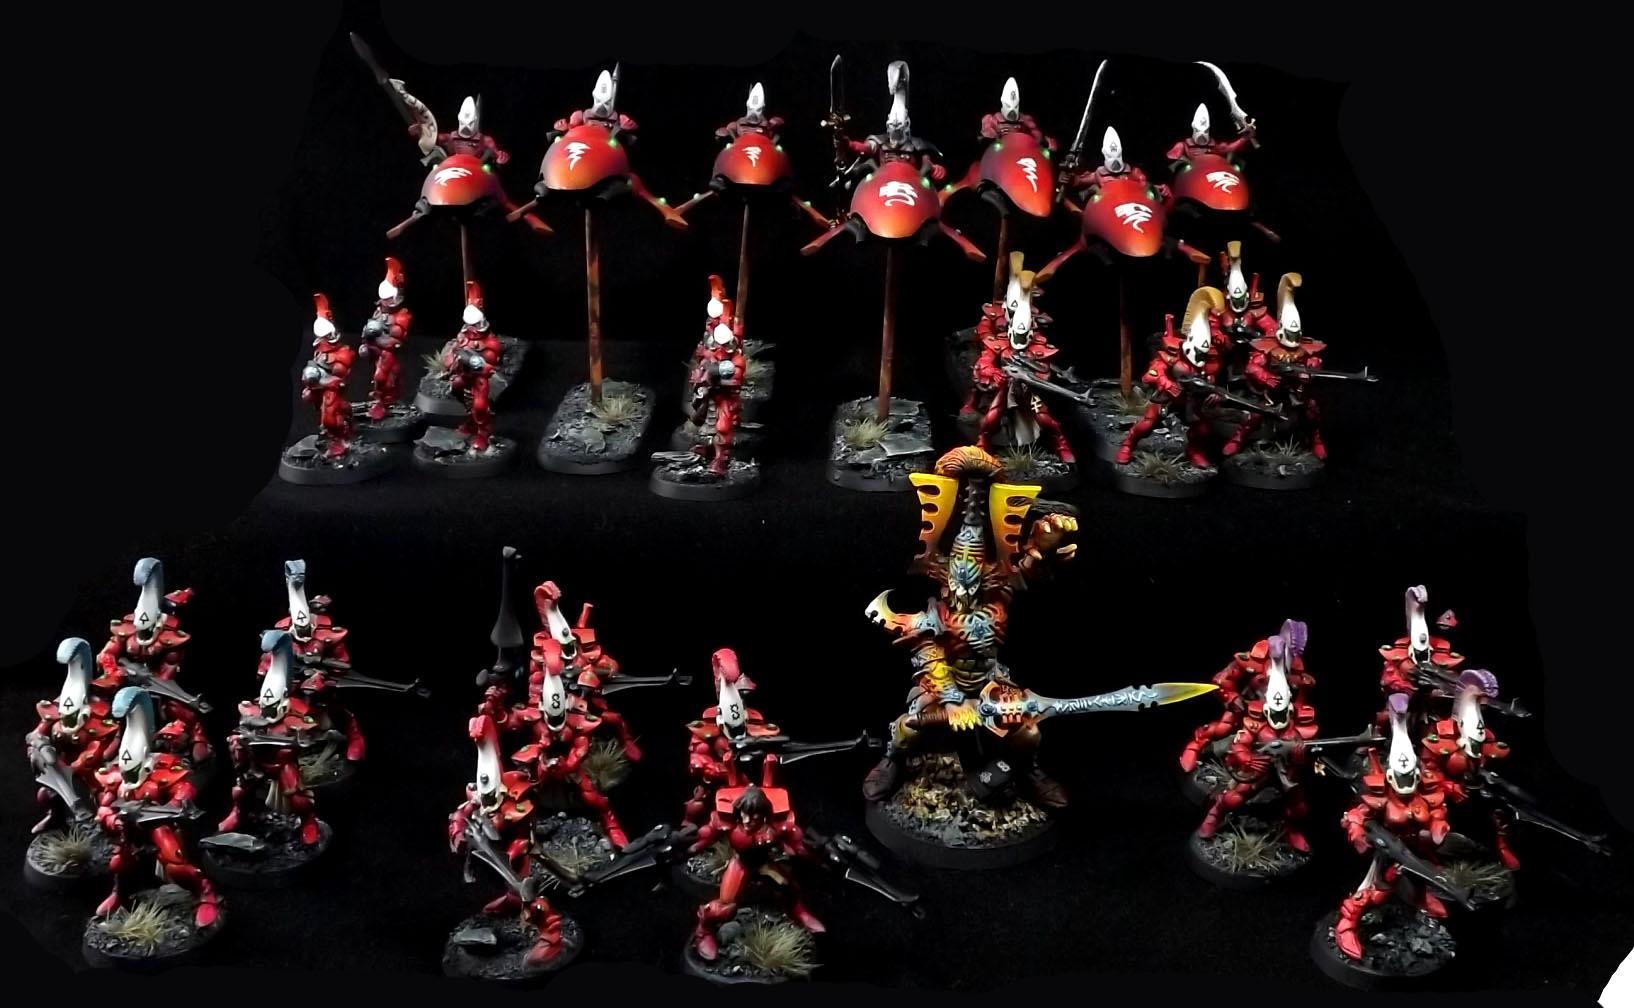 Army, Avatar, Eldars, Flying, Khain, Red, Saim Ham, Urban, Warhammer 40,000, Warhammer Fantasy